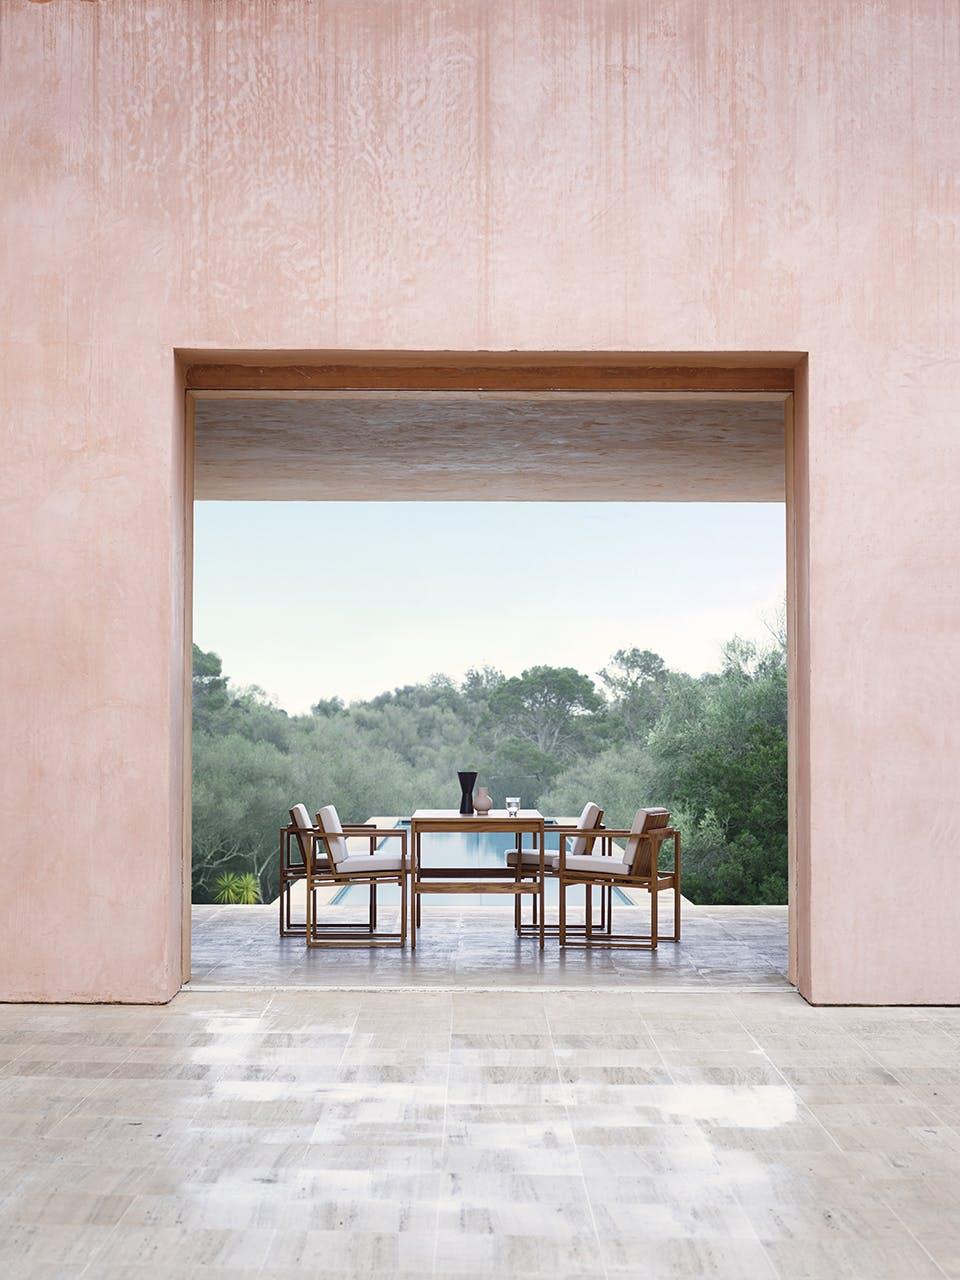 design dansk design arkitektur bord stol